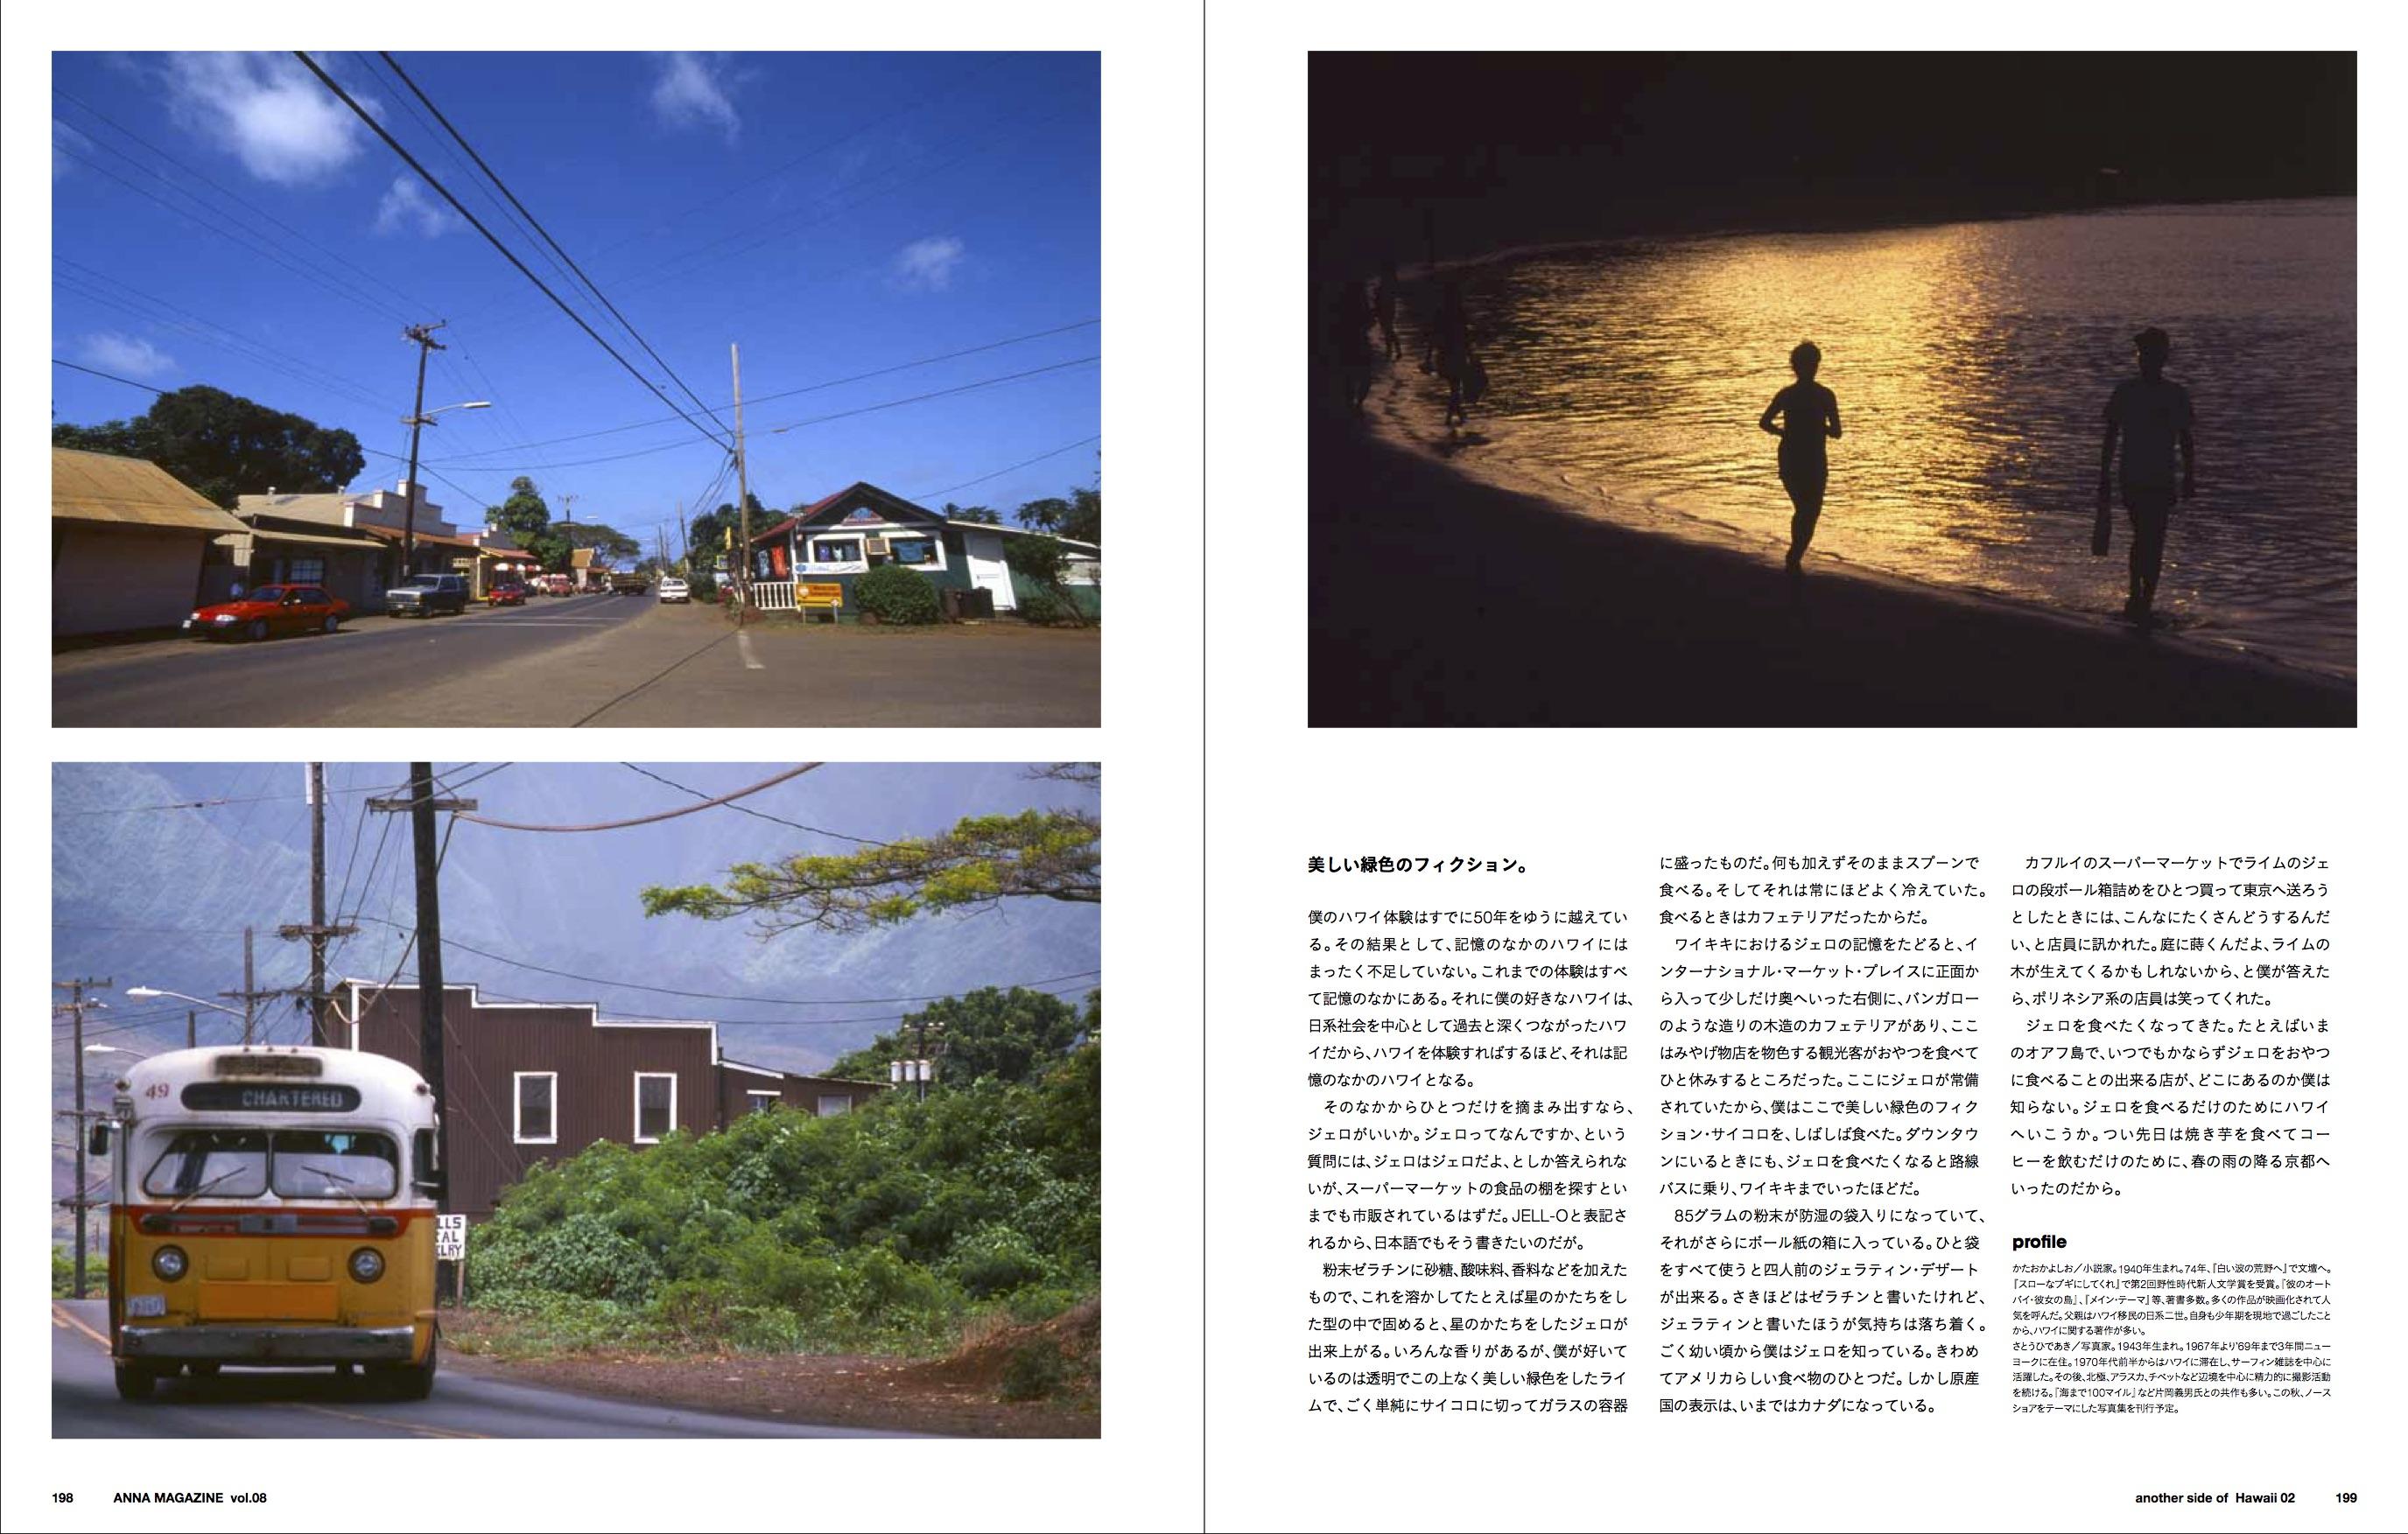 anna magazine vol.8 P100